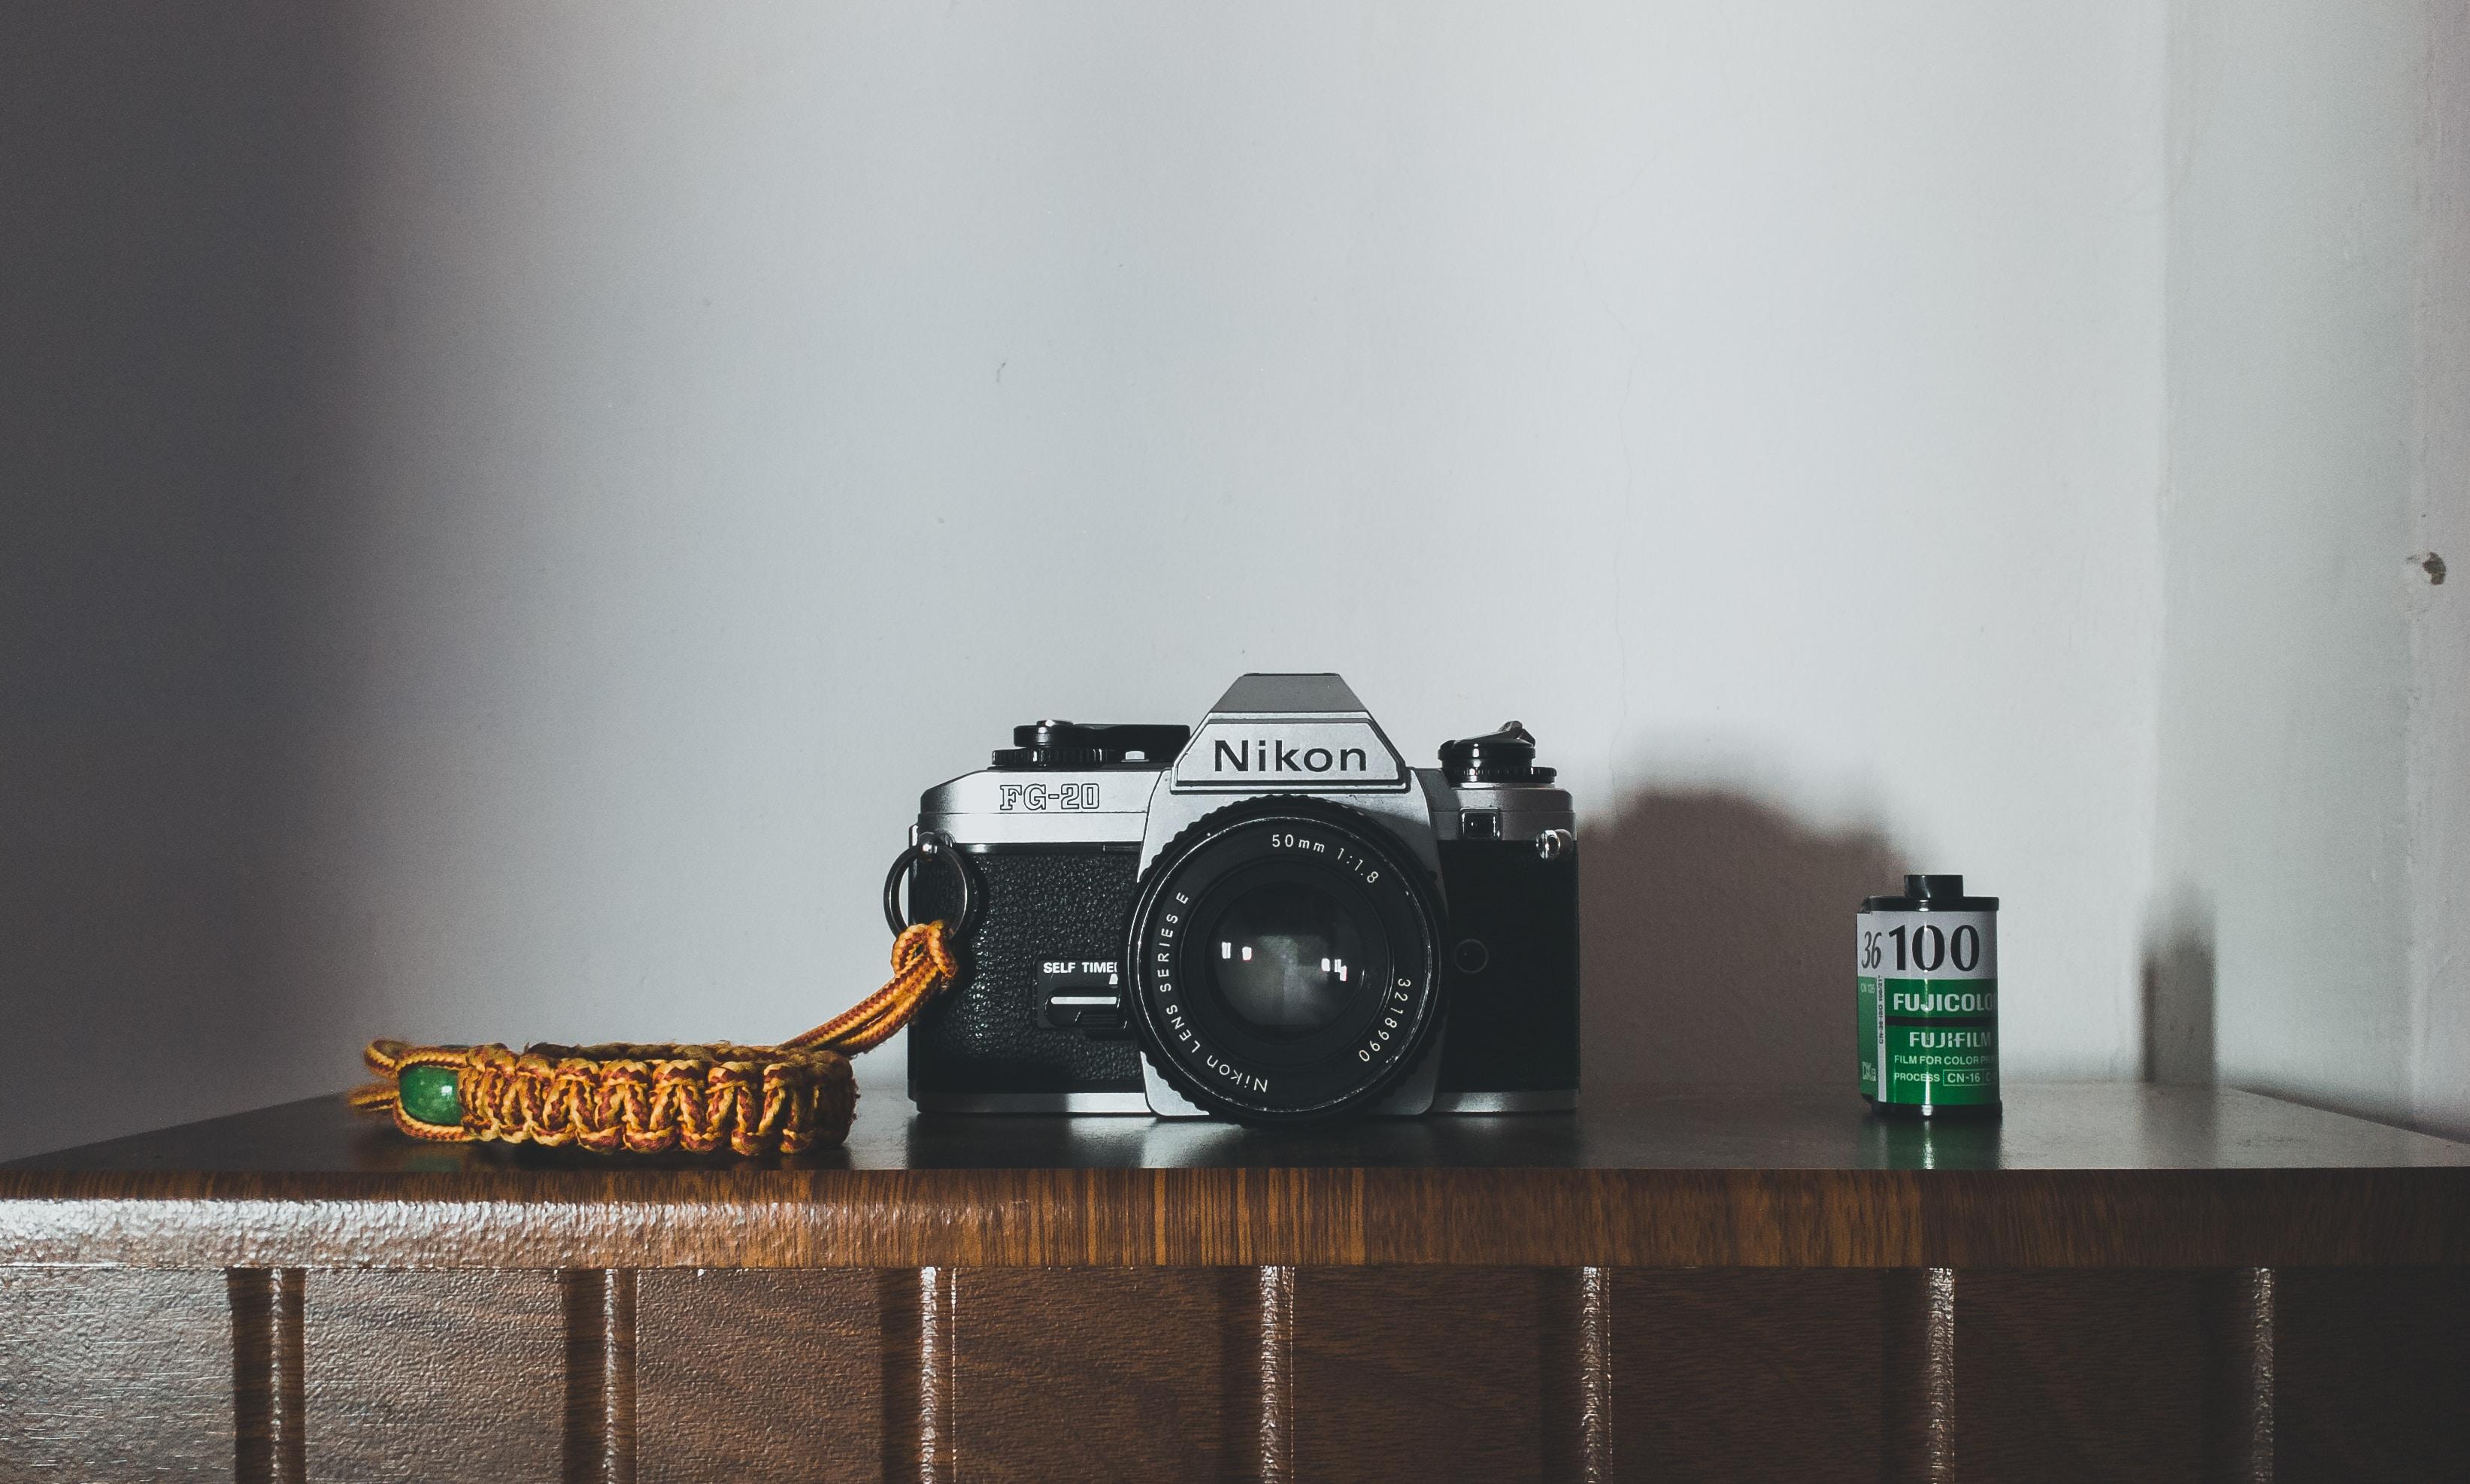 black and gray Nikon SLR camera on table